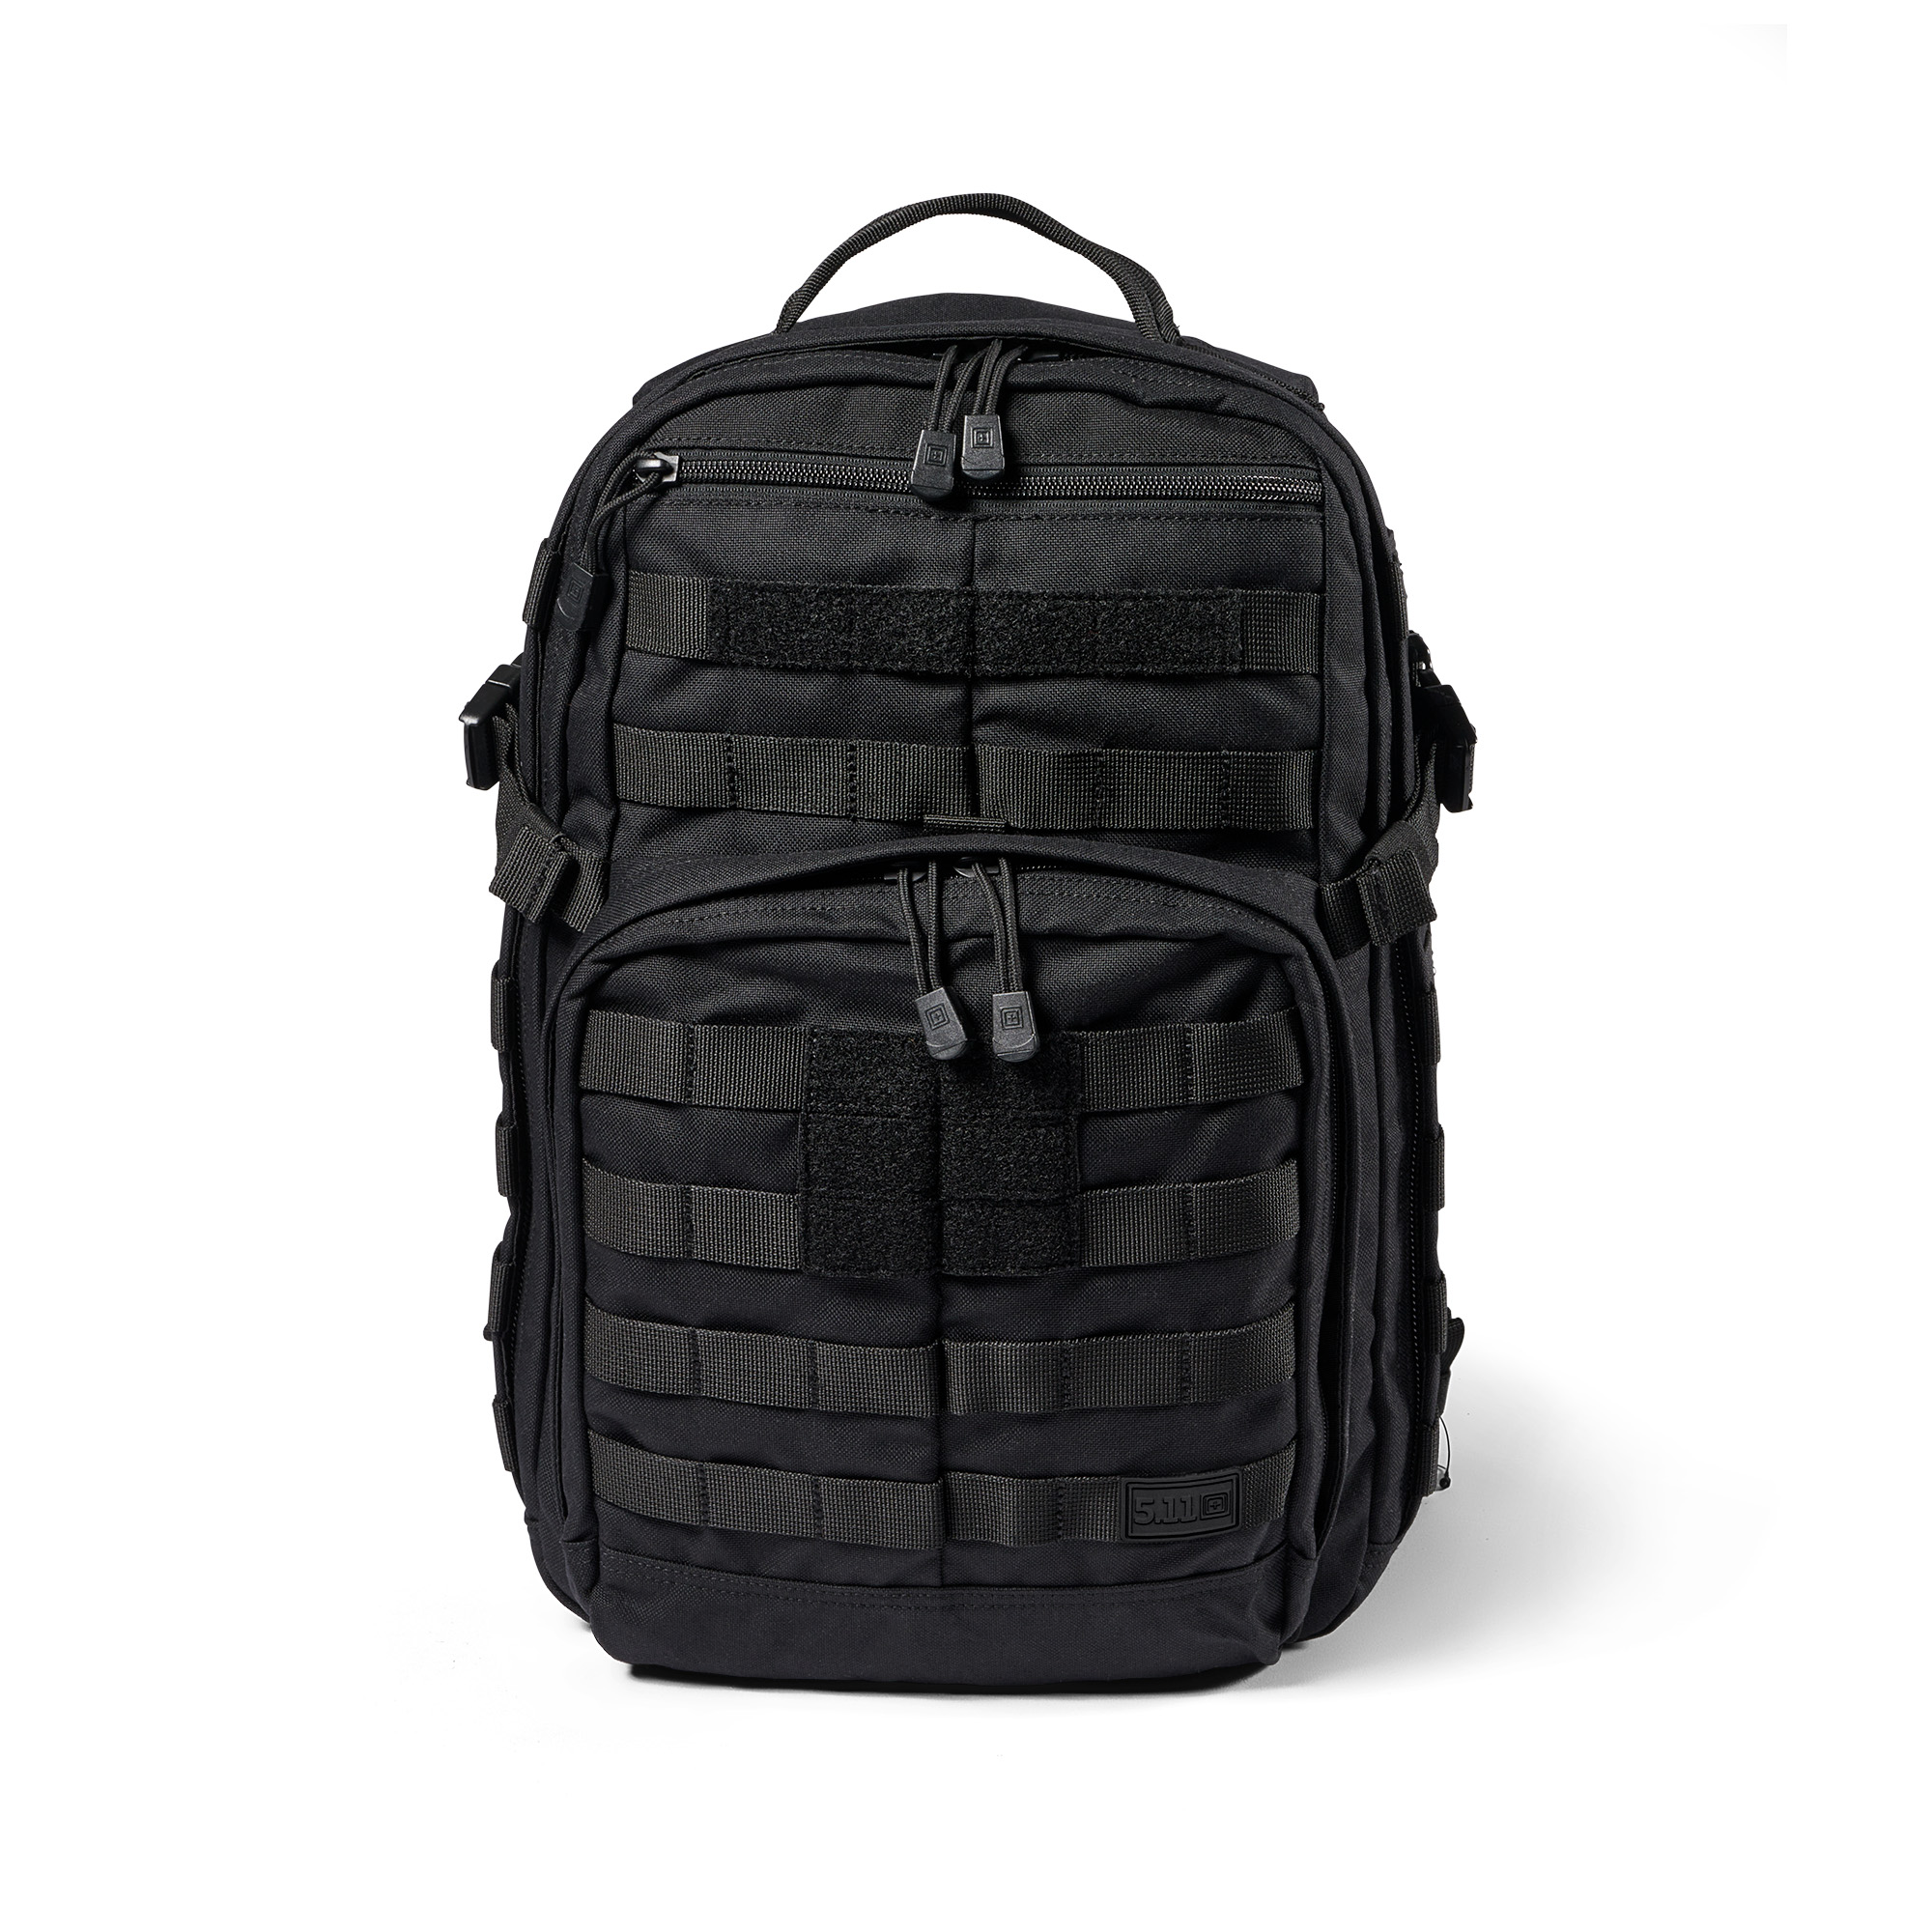 Balo 5.11 Tactical Rush 12 2.0